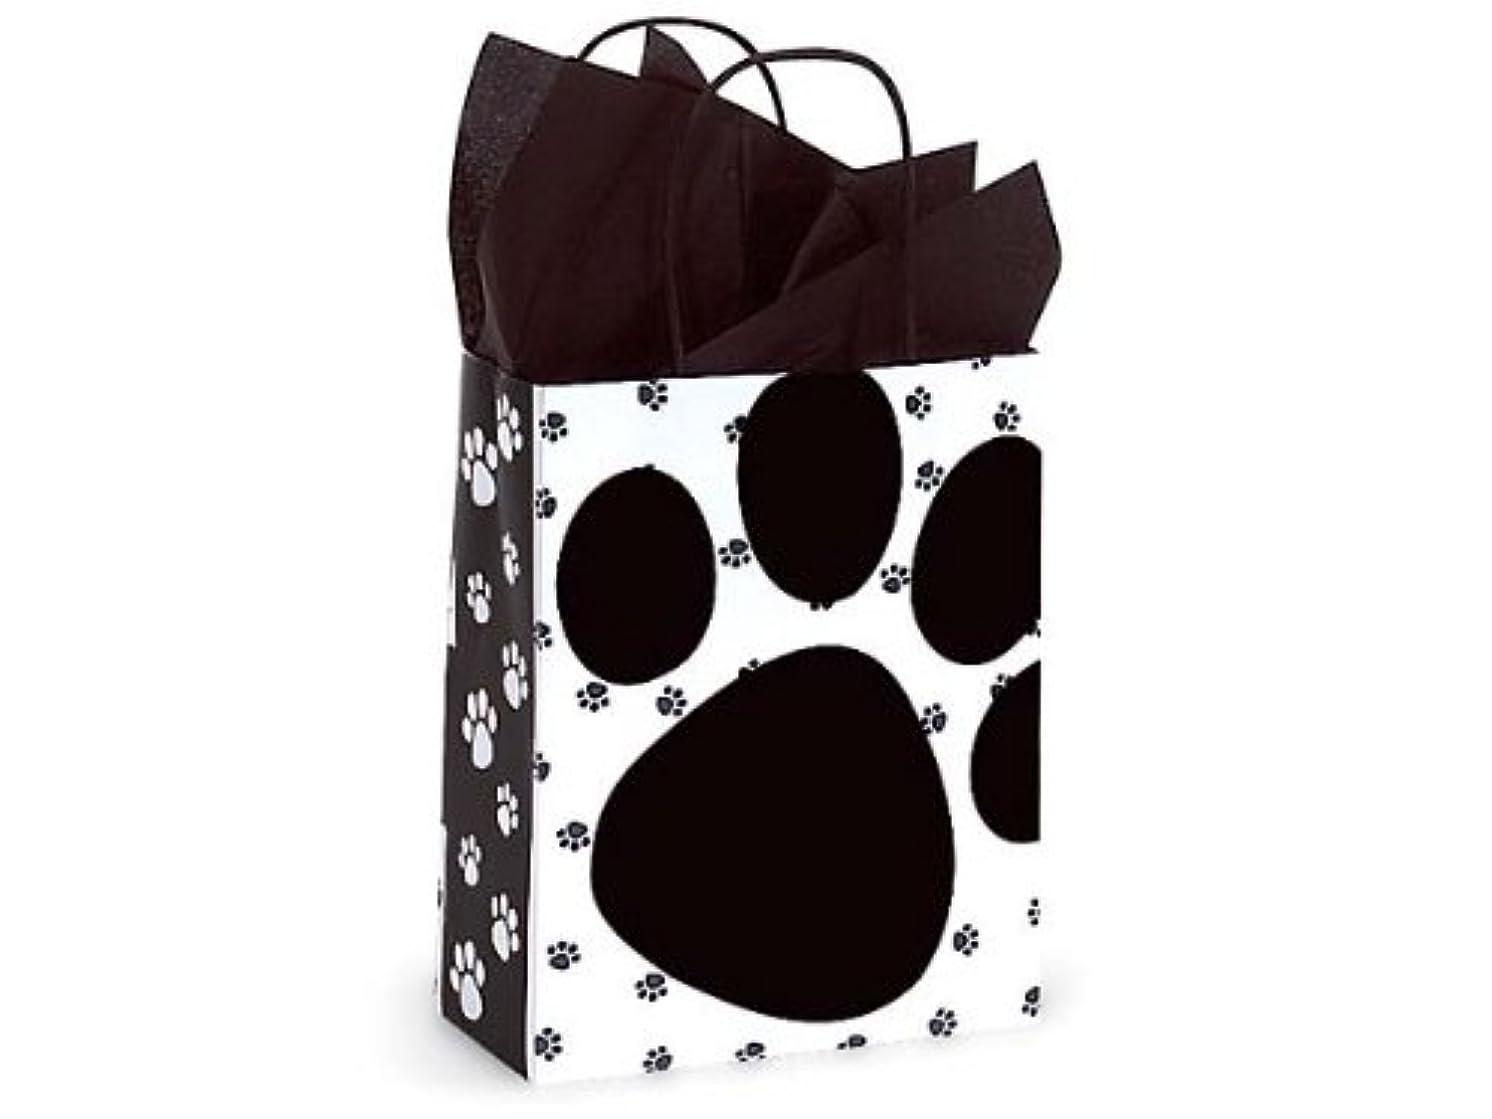 Pooch's Paw Doggie Print Paper Medium Shopper Gift Bag - Quantity of 5